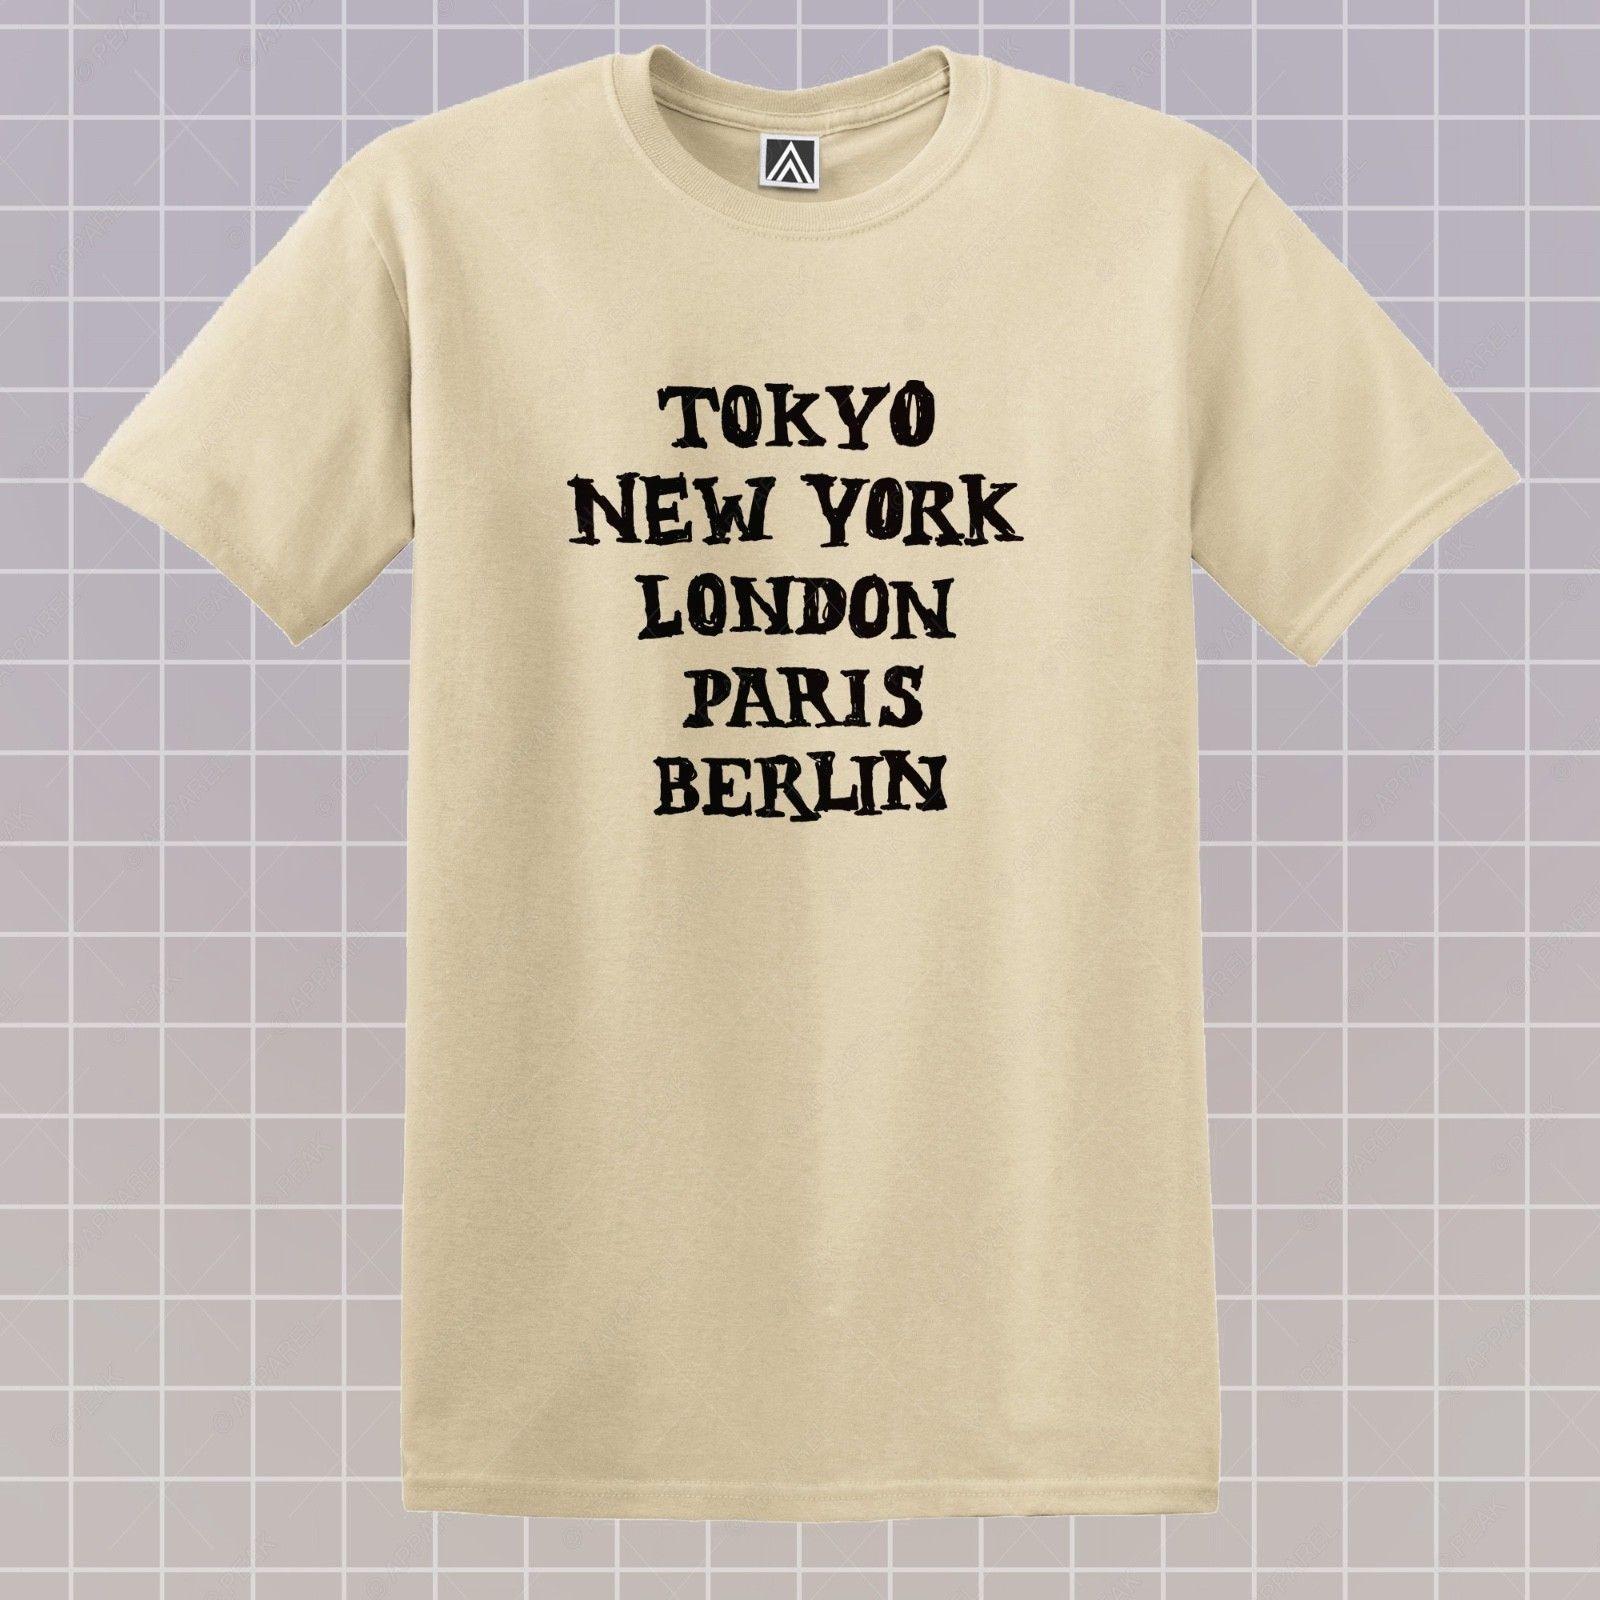 PARIS NEW YORK TOKYO LONDON T SHIRT UNISEX MENS WOMENS FUNNY HIPSTER FASHION